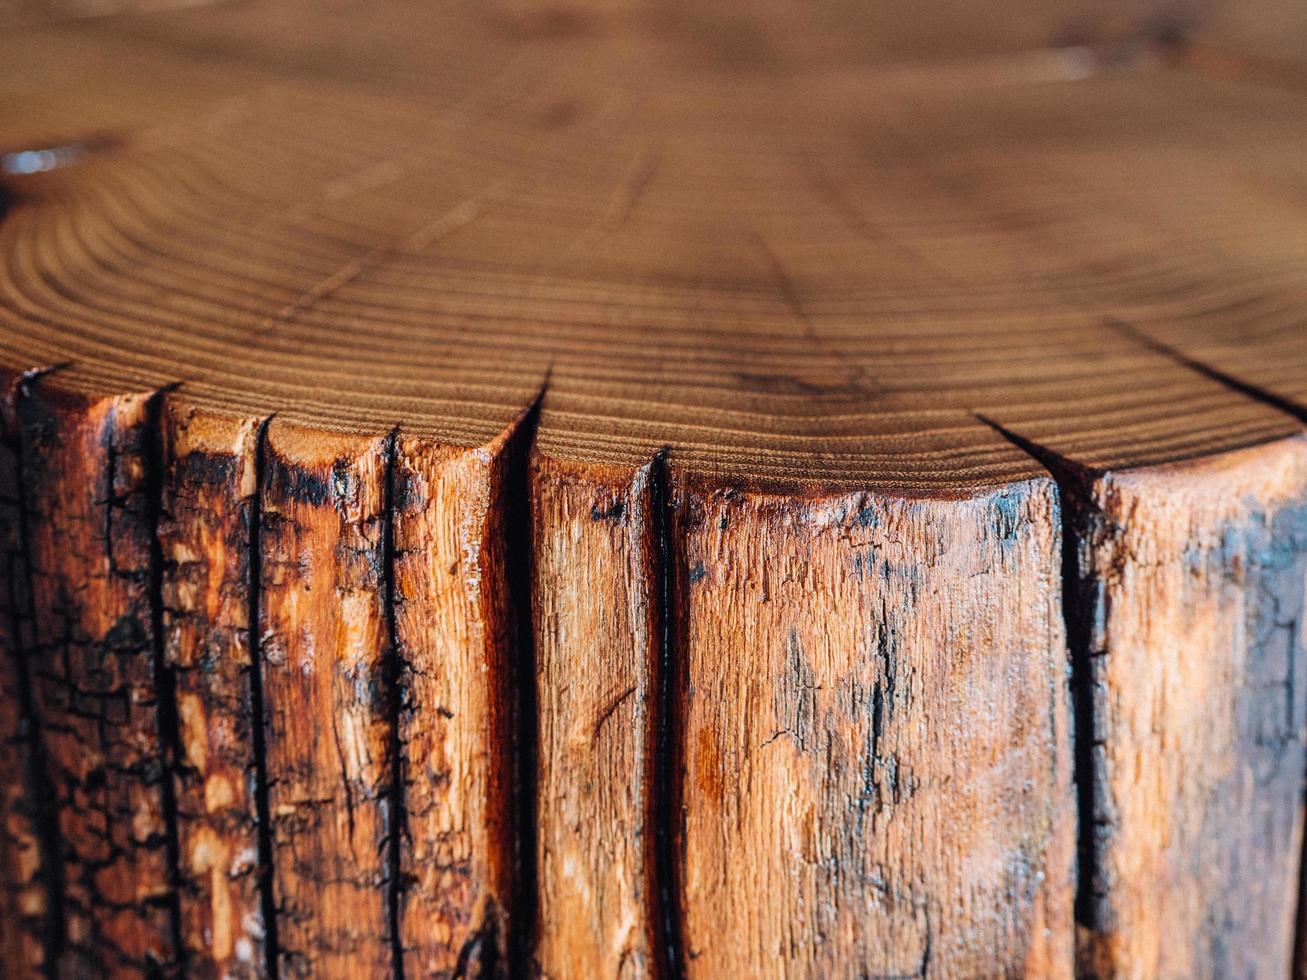 a close-up of a saw cut of a large acacia stump photo